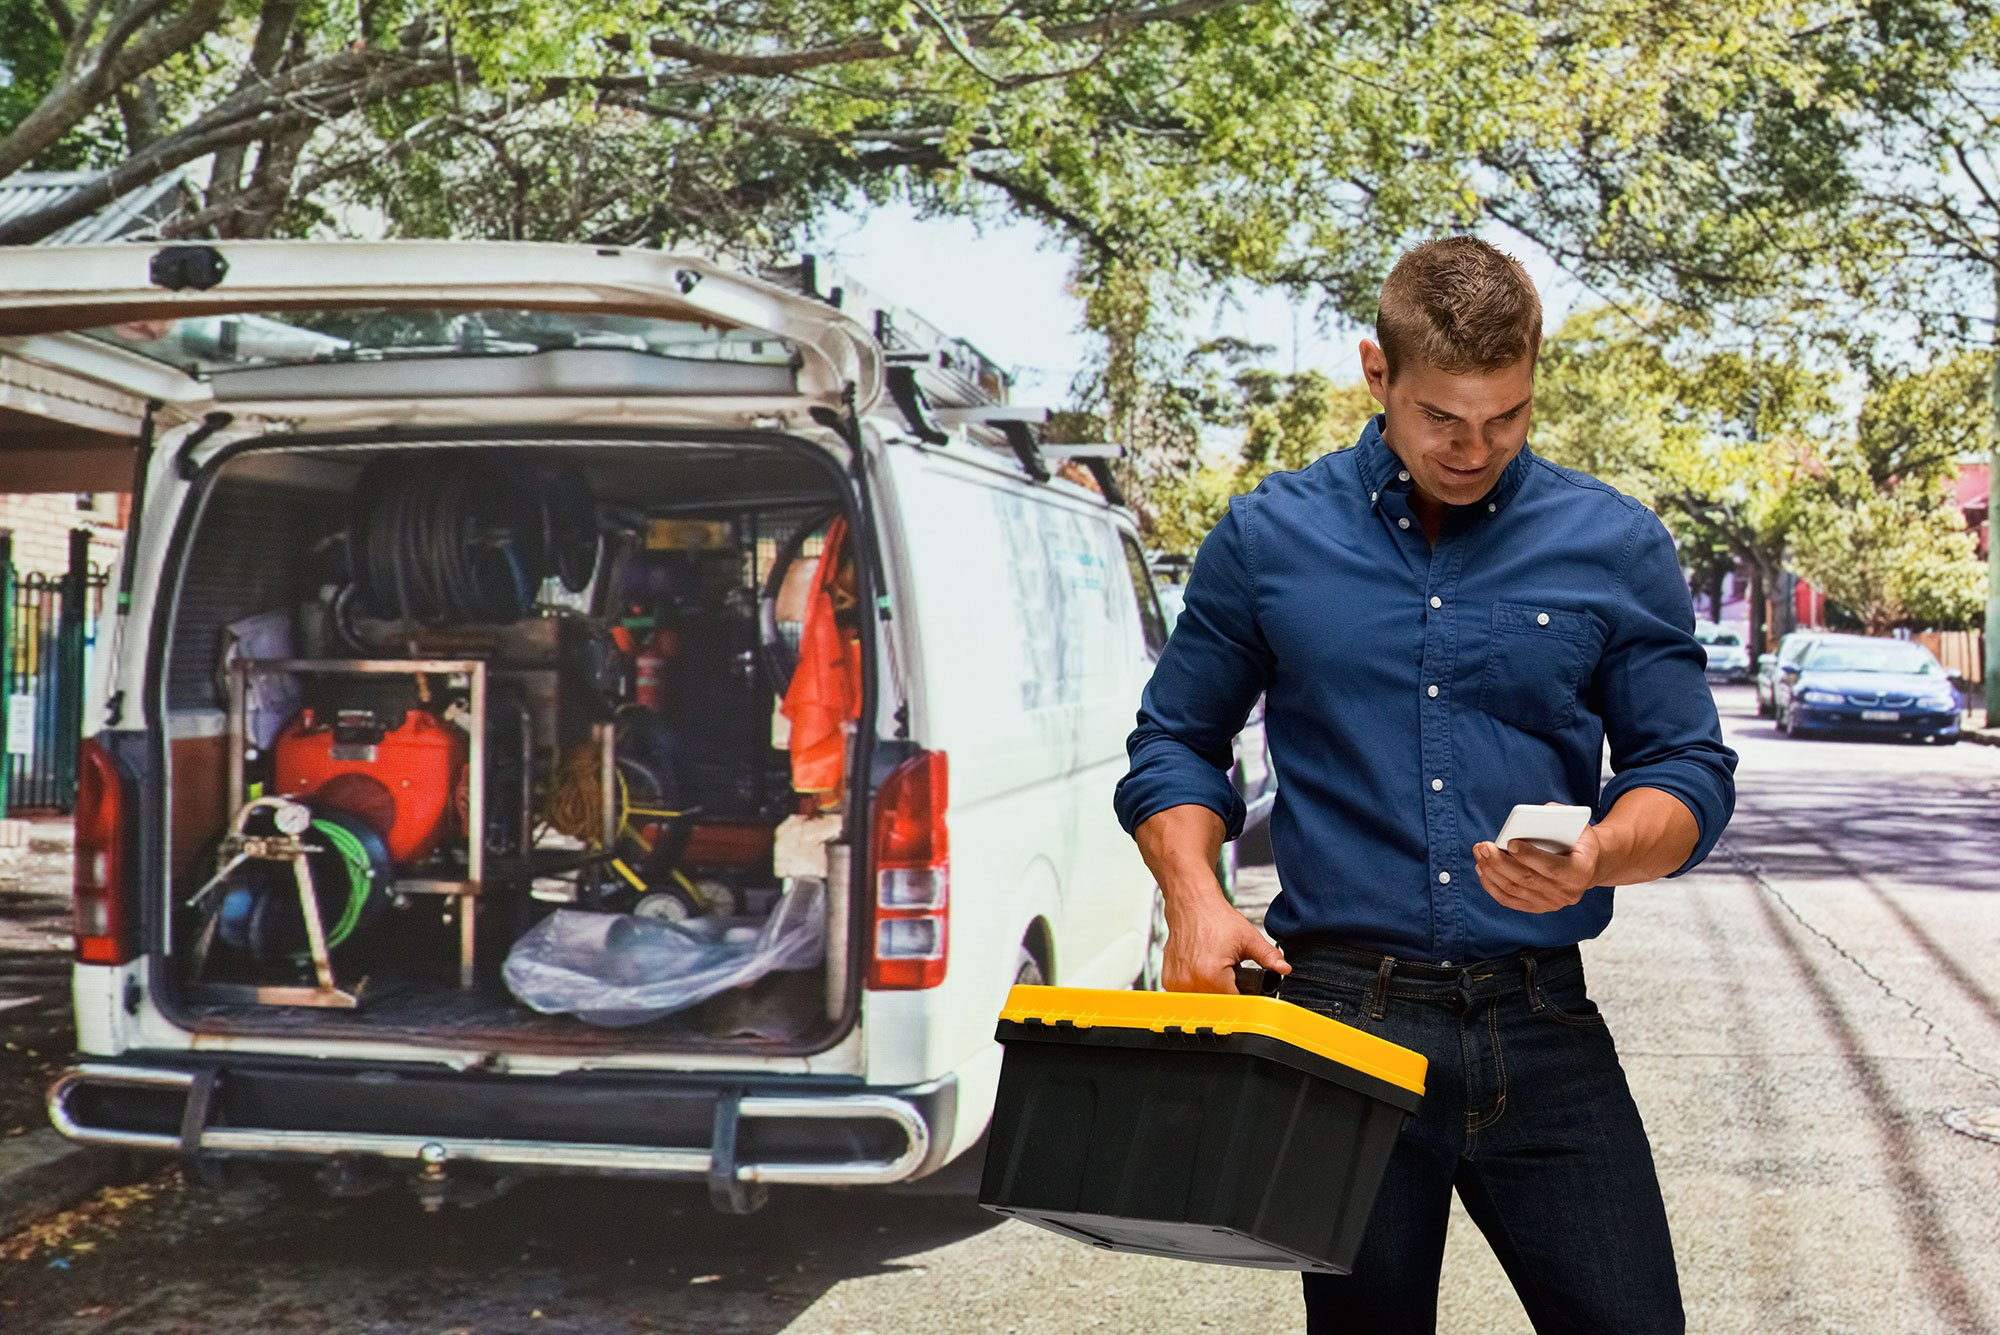 contractor-handyman-plumber-toolbox-van-mobile-phone